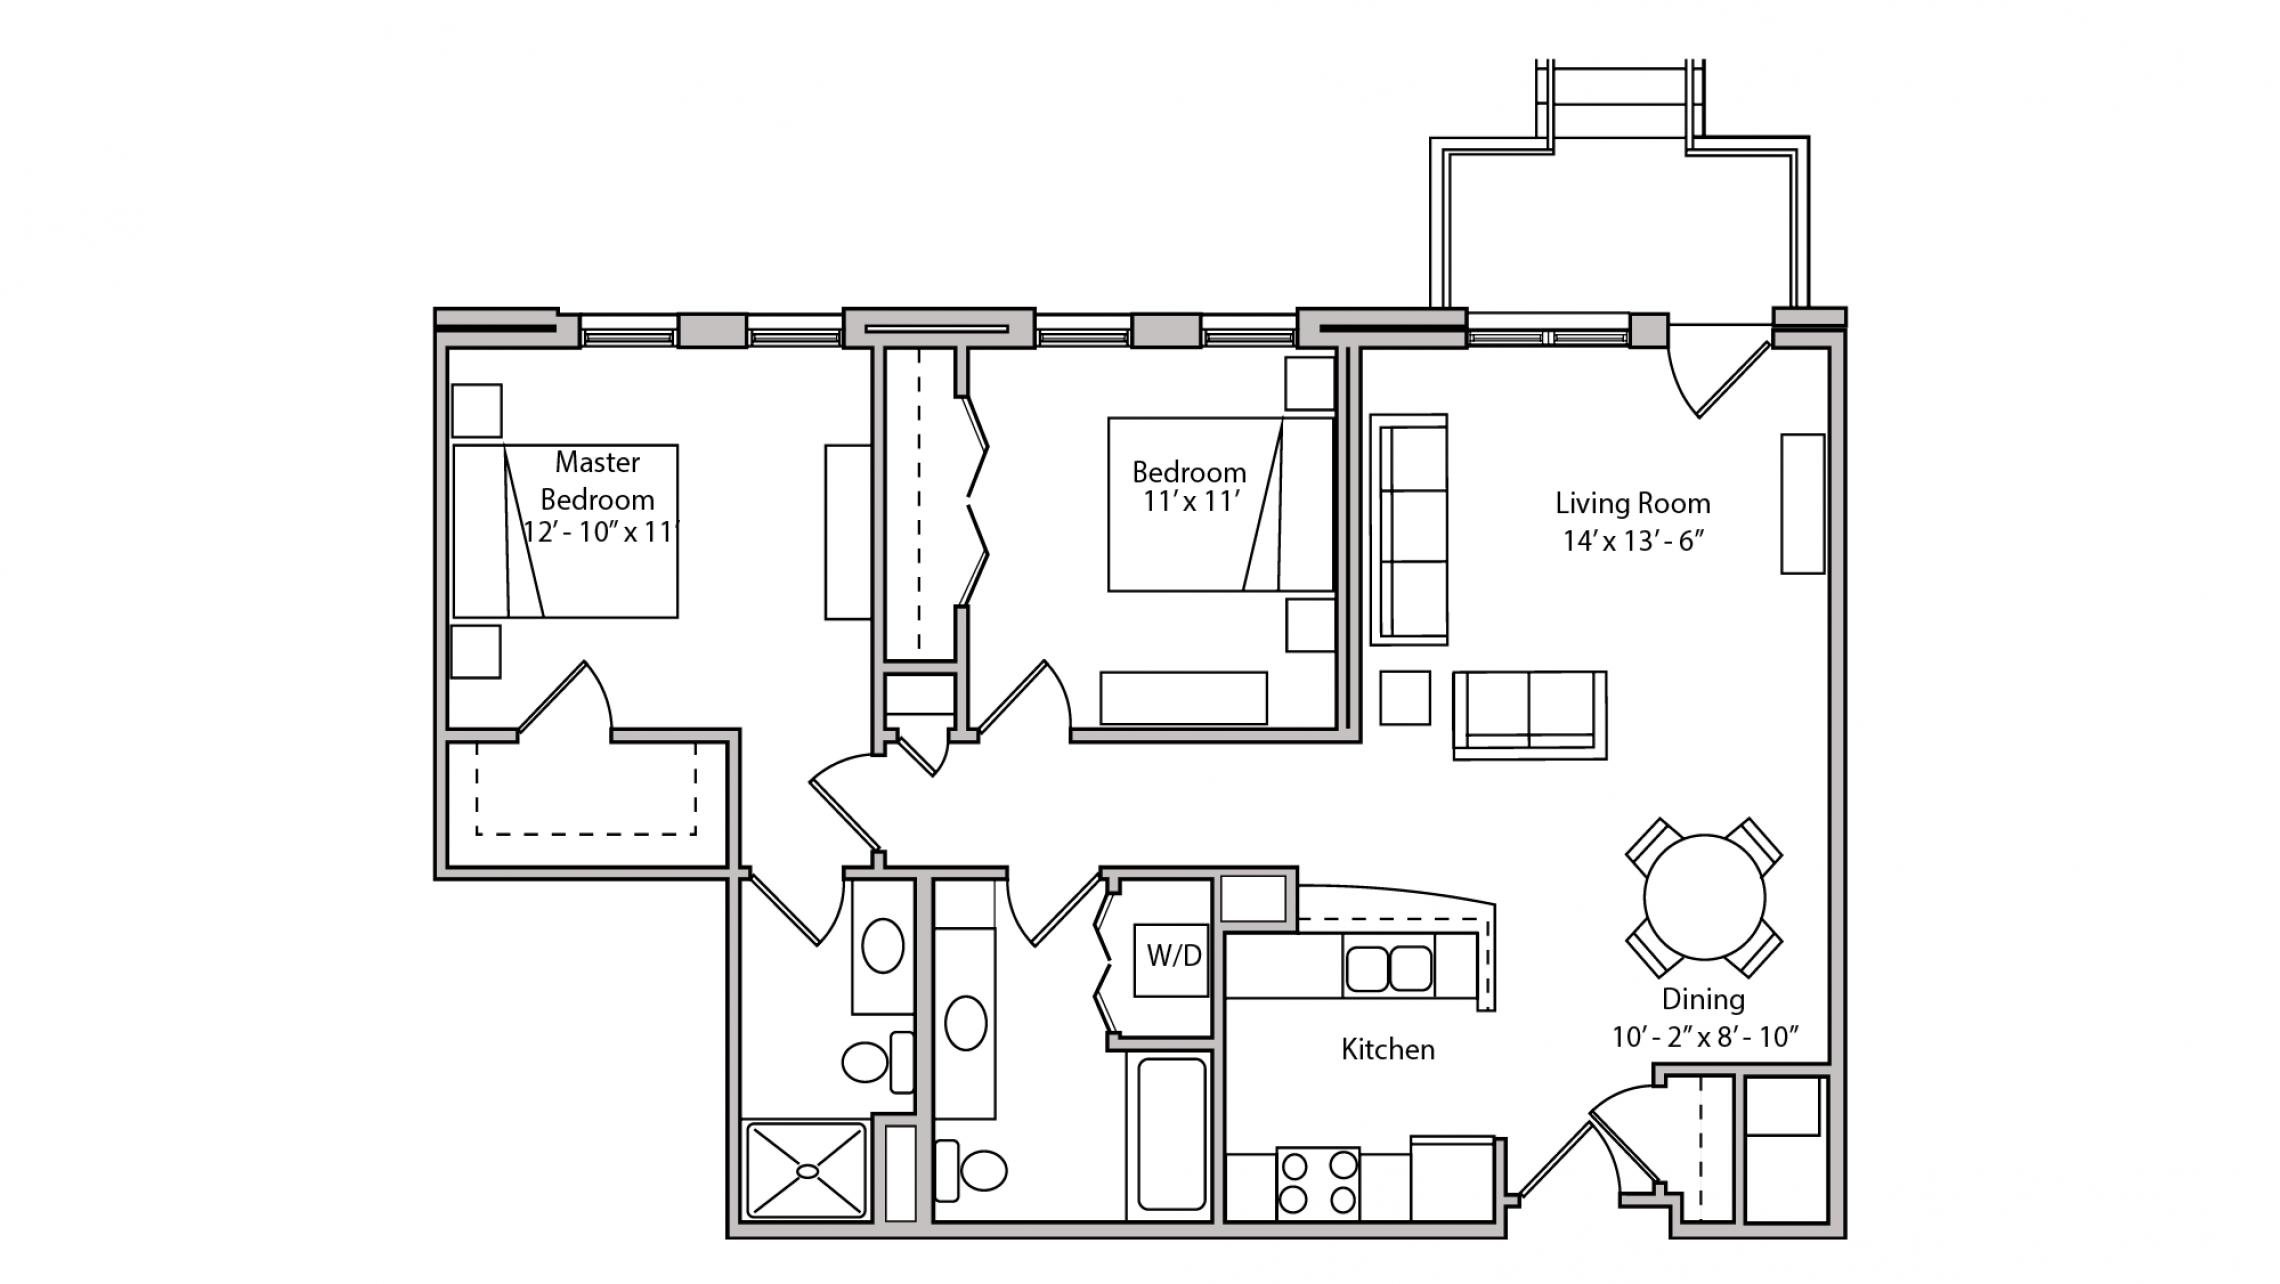 ULI The Depot 2-107 - Two Bedroom, Two Bathroom